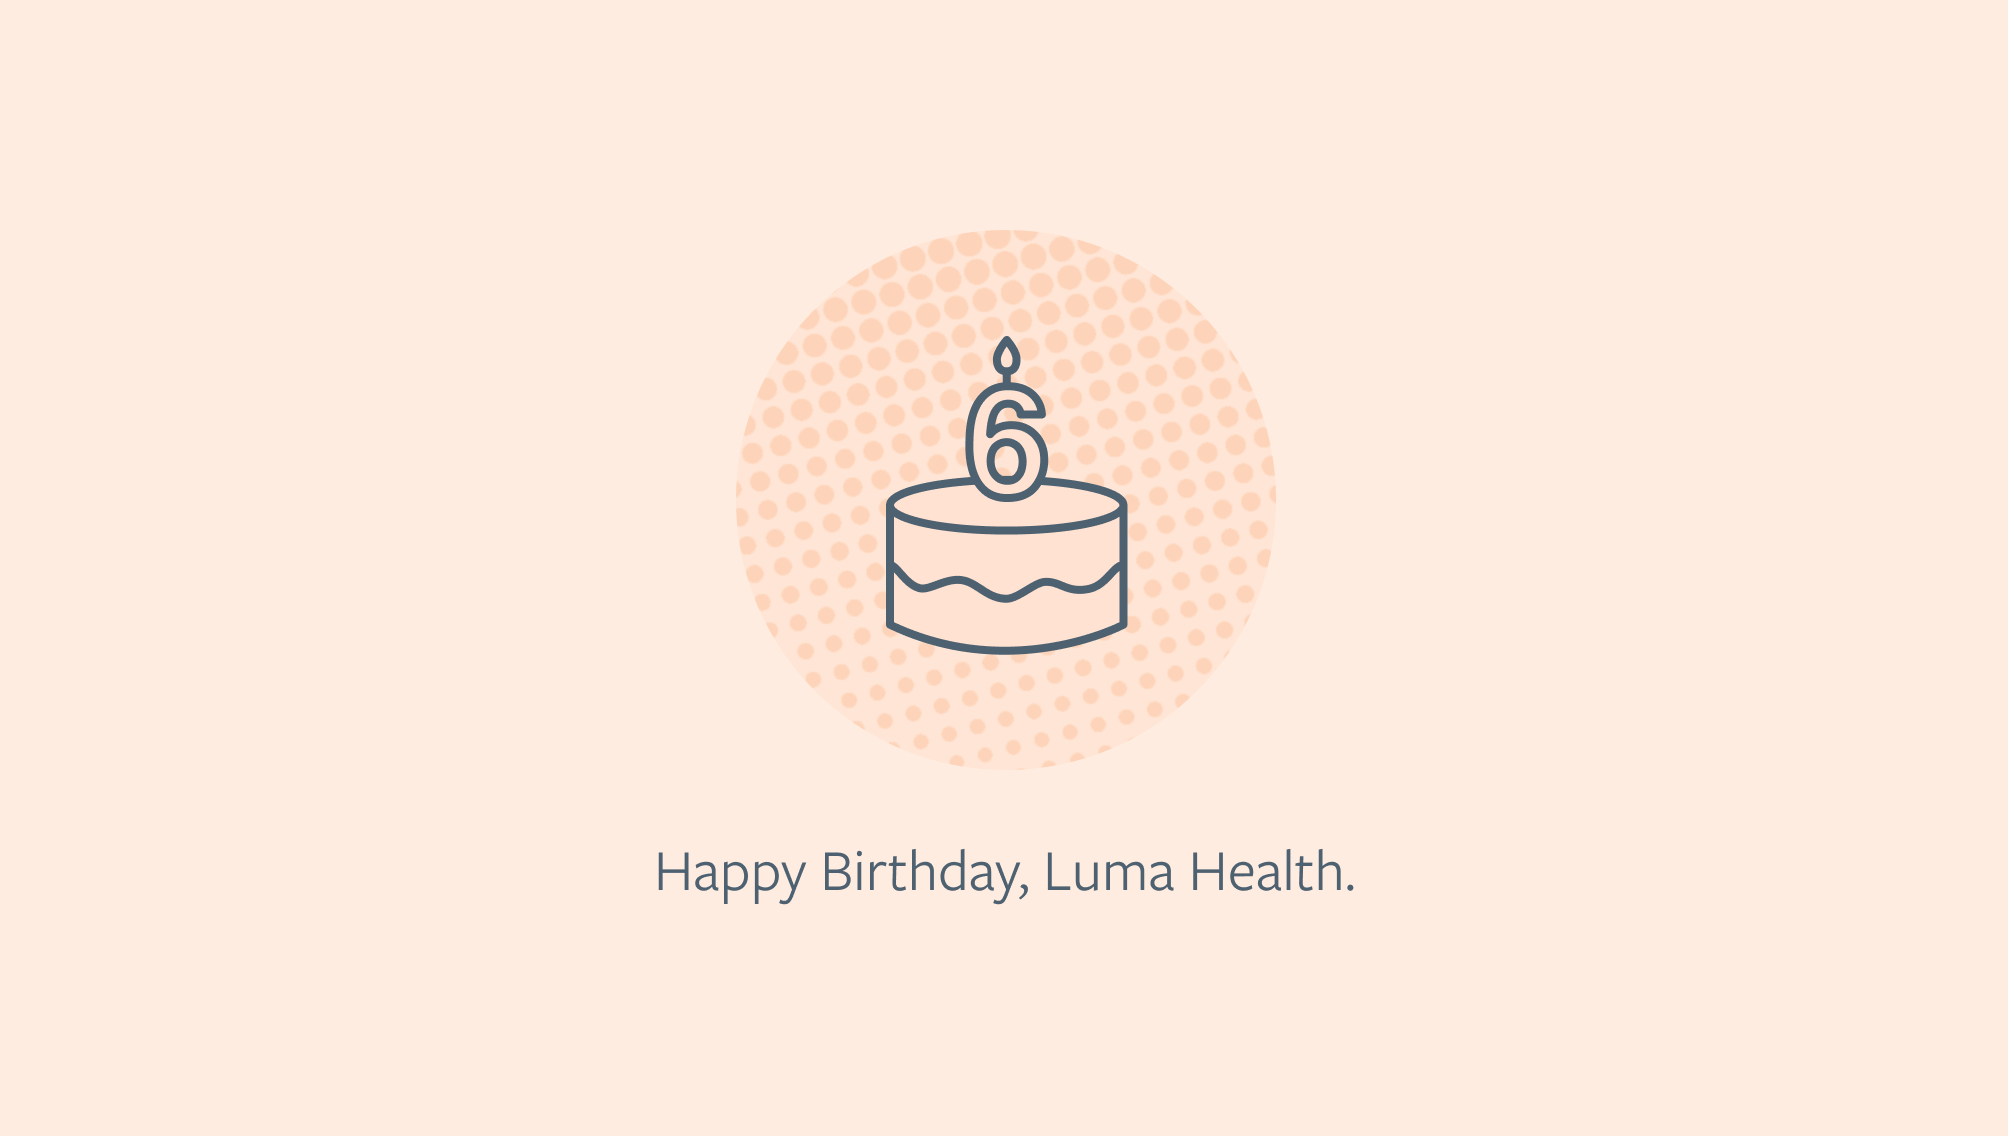 luma healths 6 year anniversary